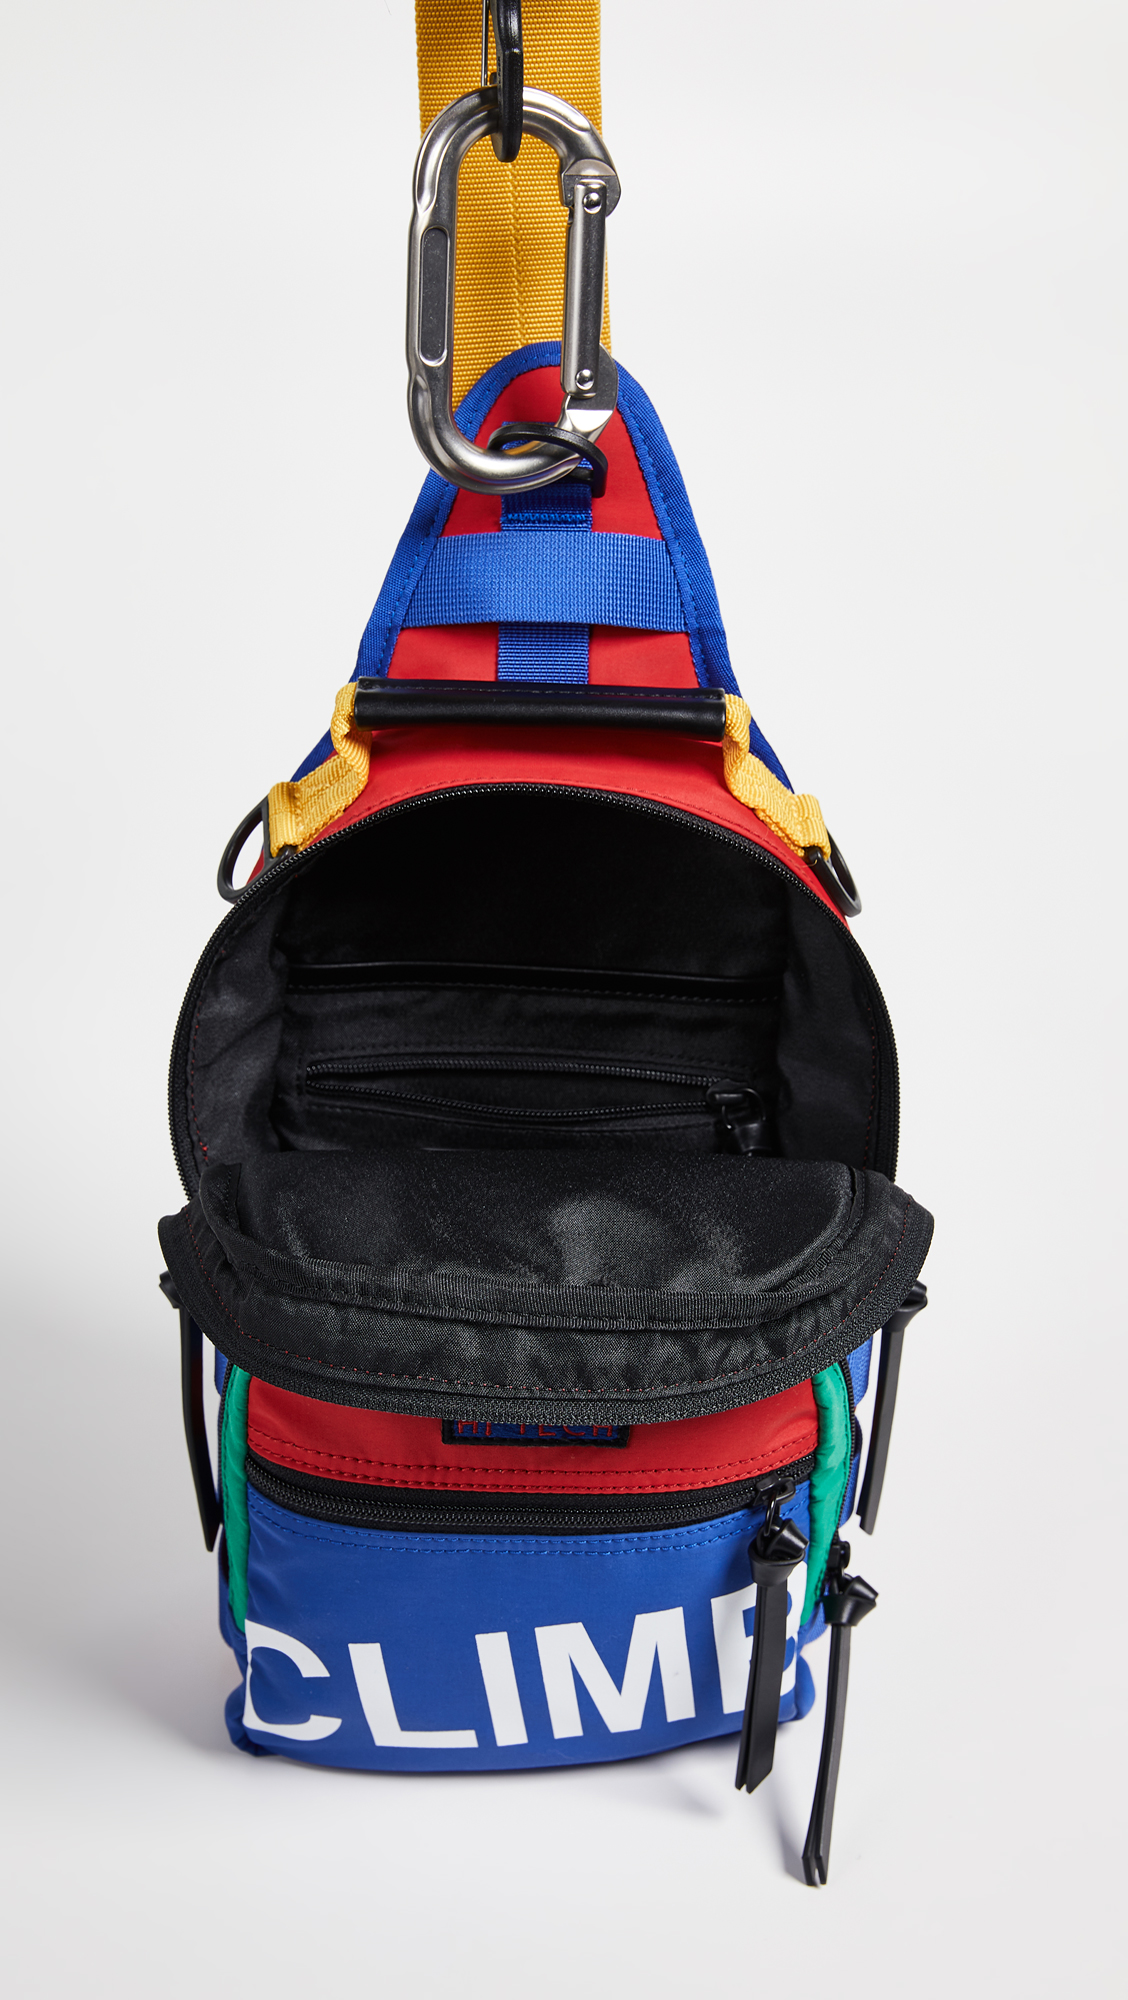 55f8fa191bfe Polo Ralph Lauren Hi Tech Sling Bag